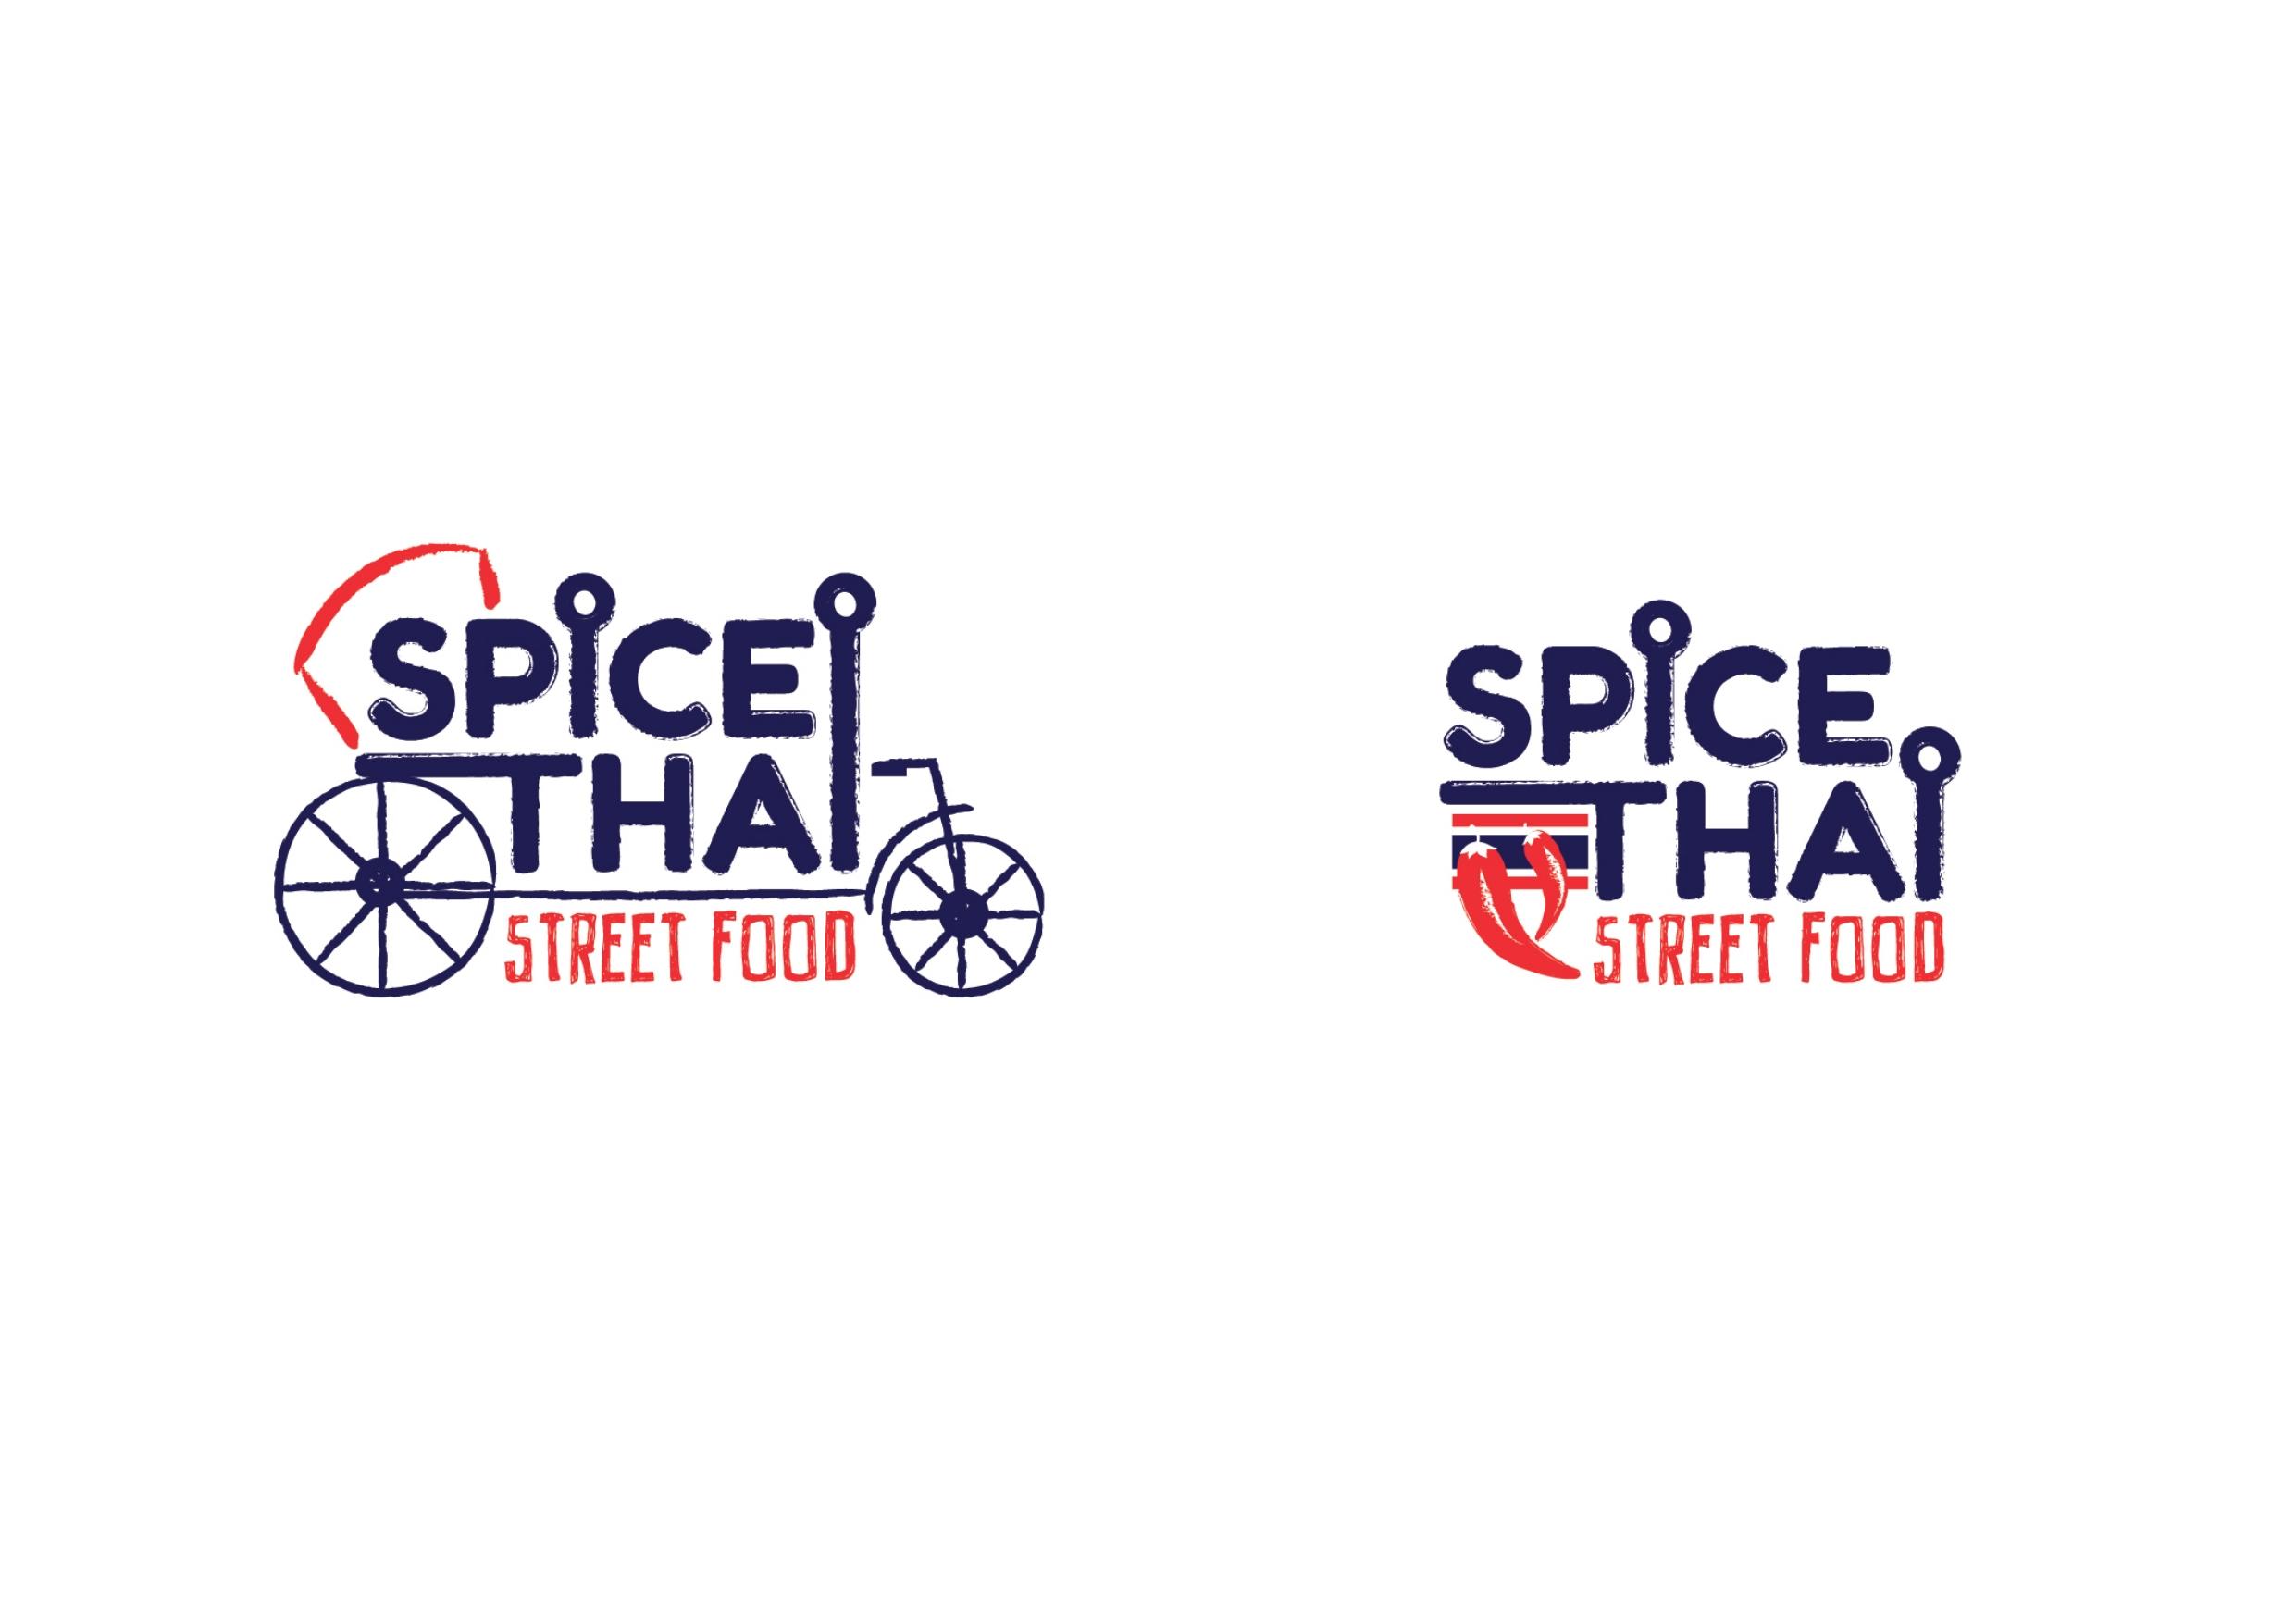 Spice_Thai_logo_ideas_v2-01.jpg